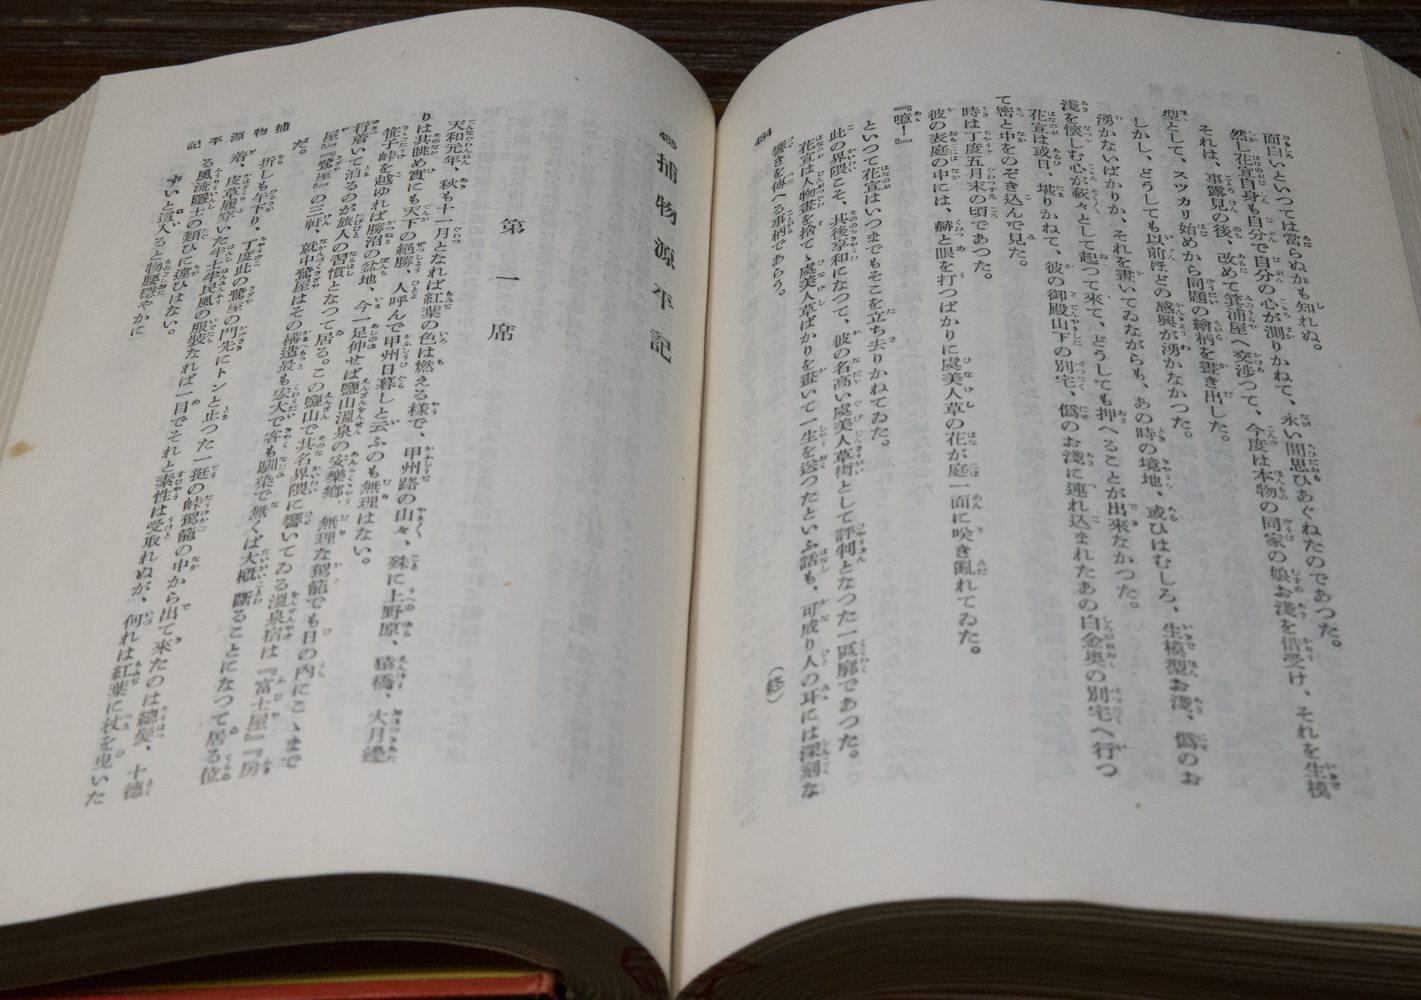 白井喬二の「捕物源平記」